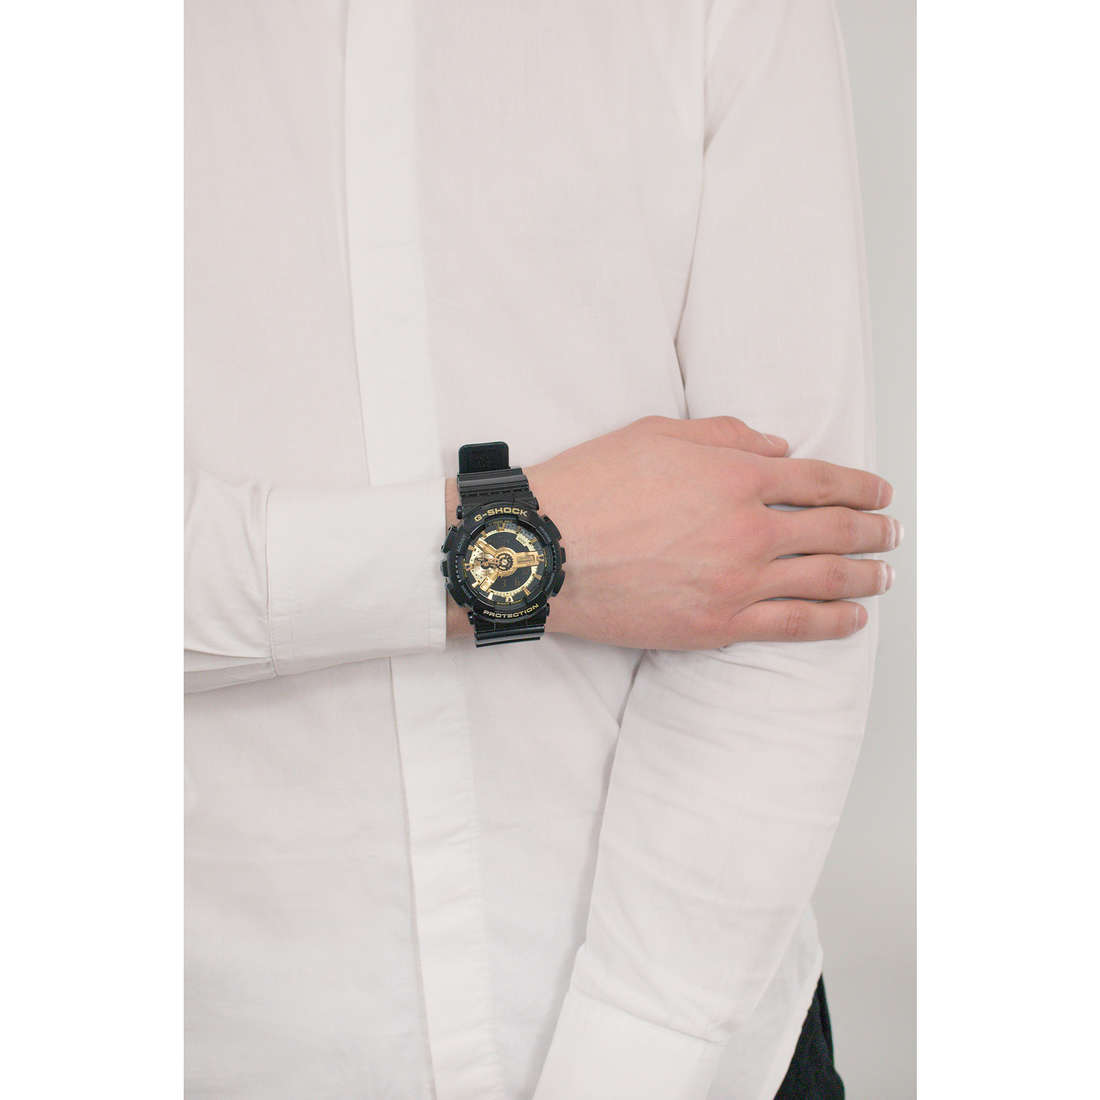 Casio digitali G-Shock uomo GA-110GB-1AER indosso